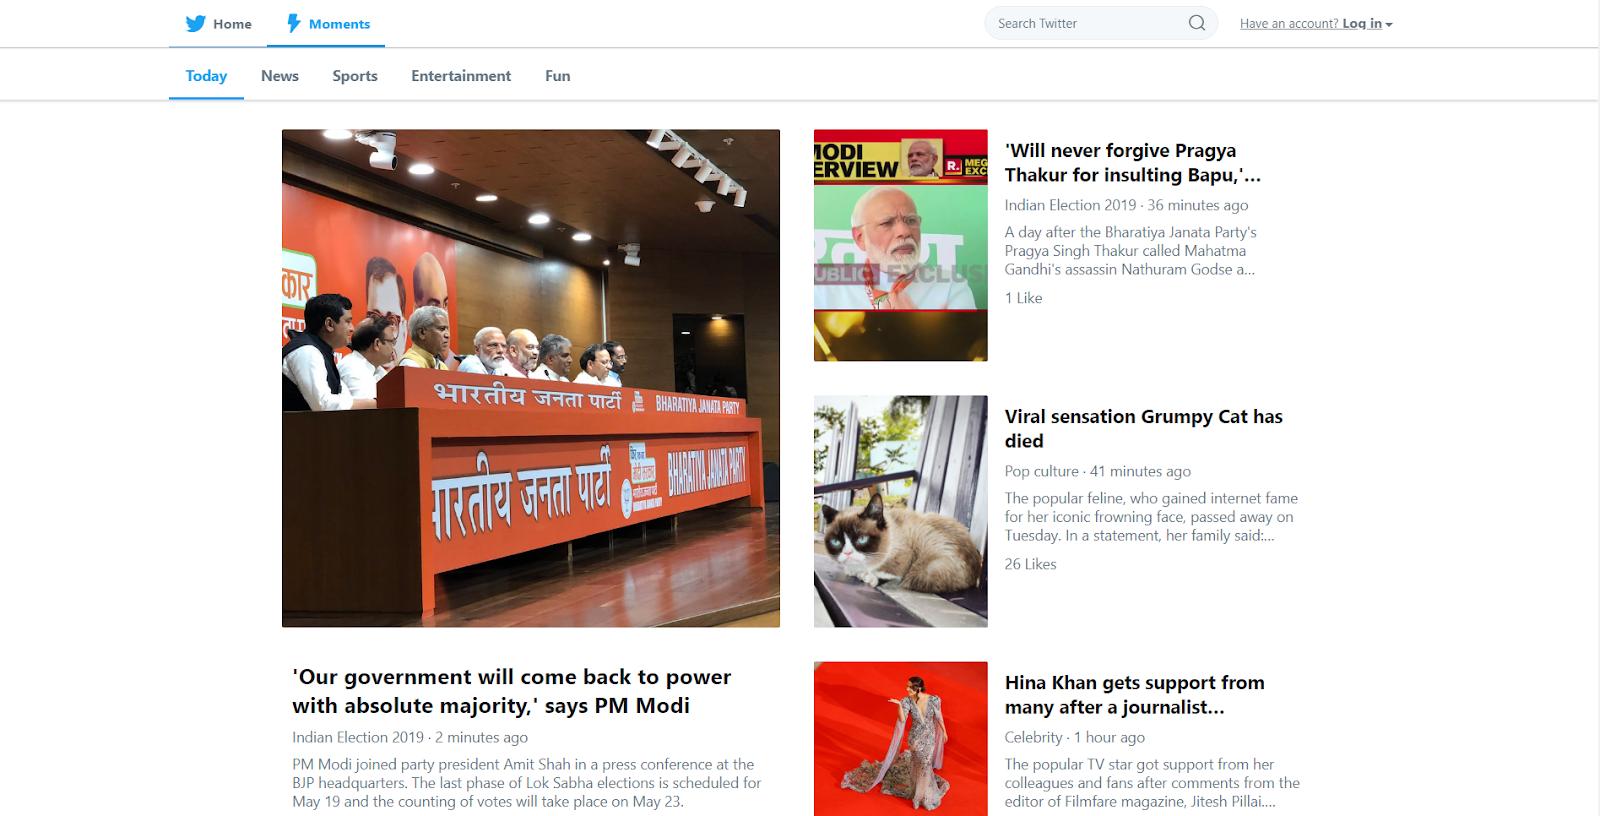 How to Find Viral Videos: Instagram, Twitter, YT & Reddit | IDH